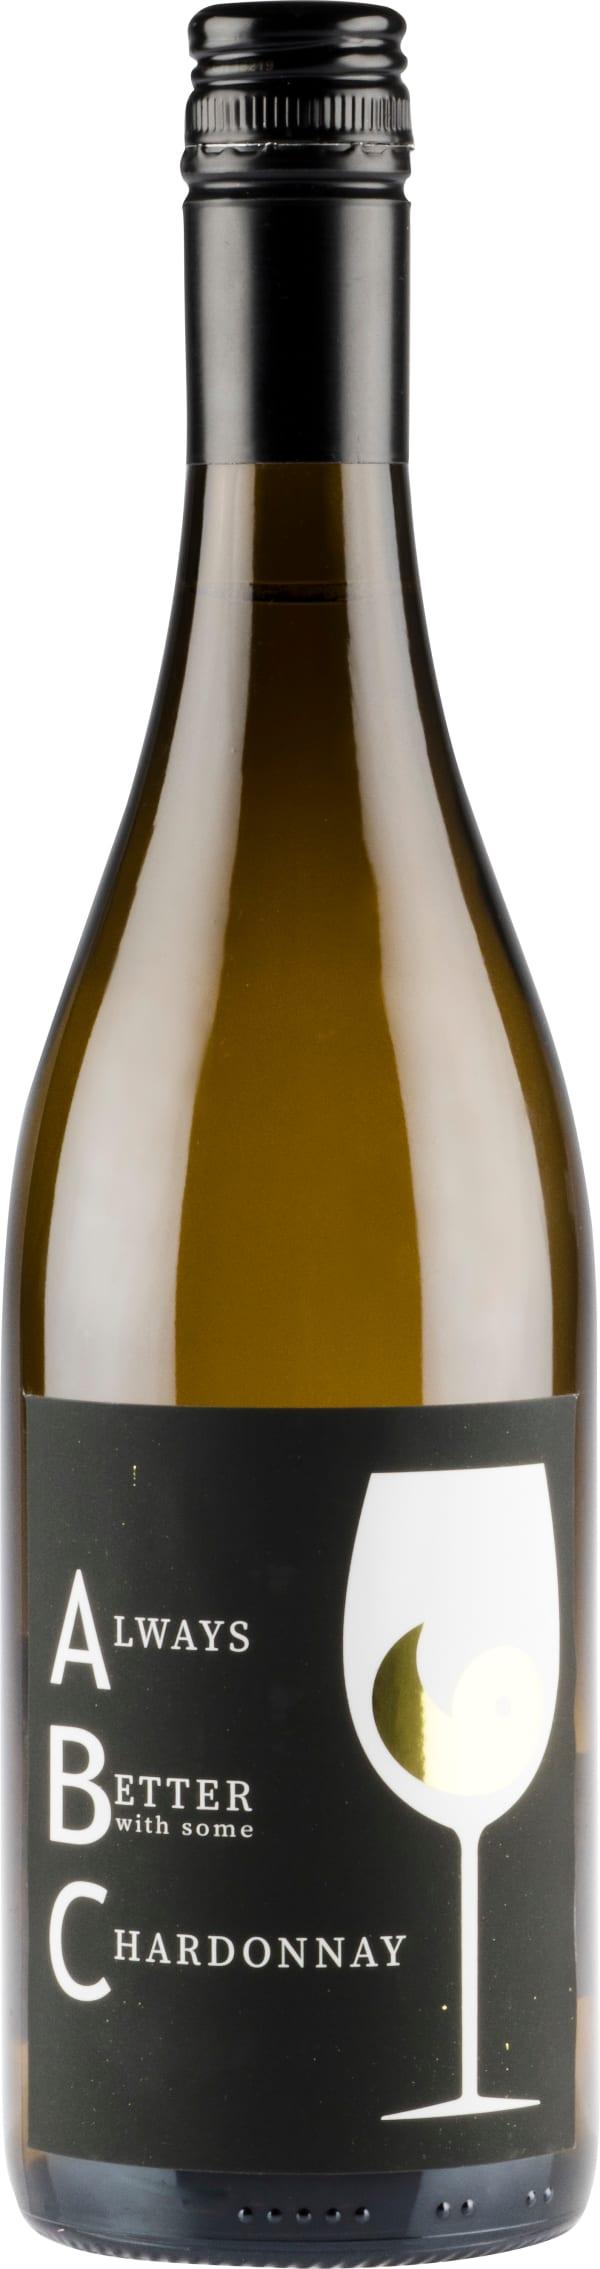 ABC Chardonnay 2020